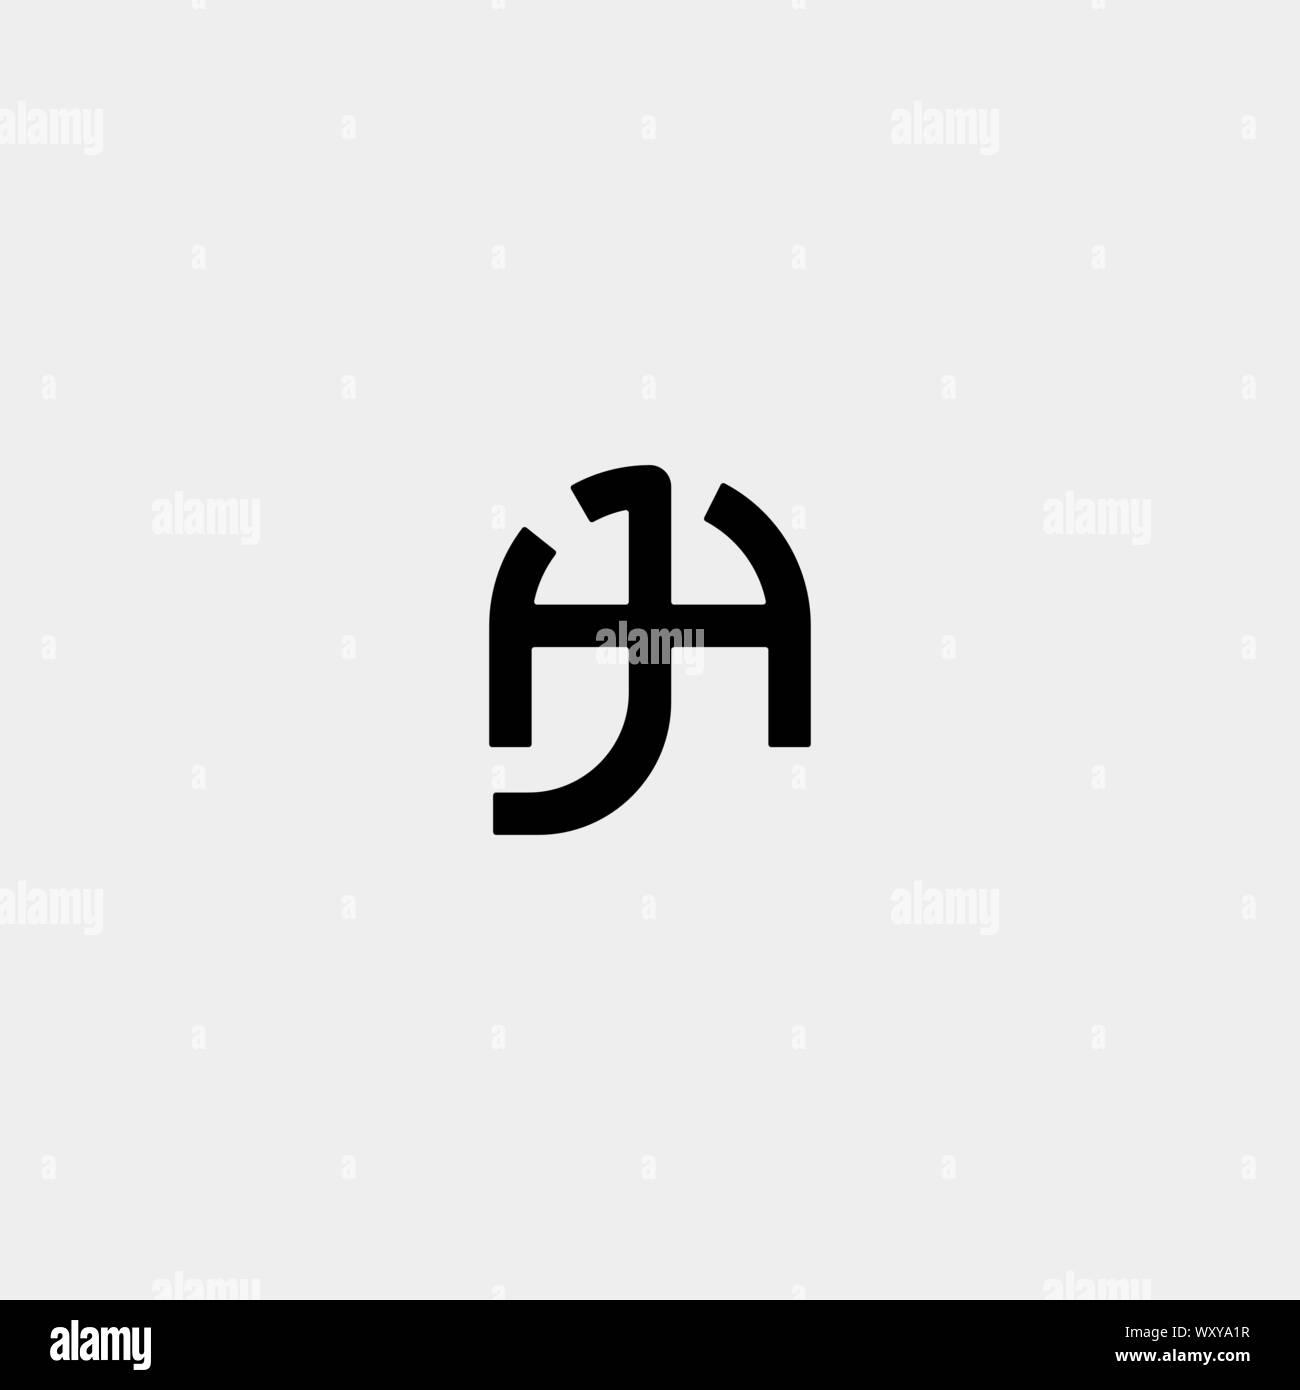 Letter Al La A L Monogram Logo Design Minimal Icon With Black Color Stock Vector Image Art Alamy